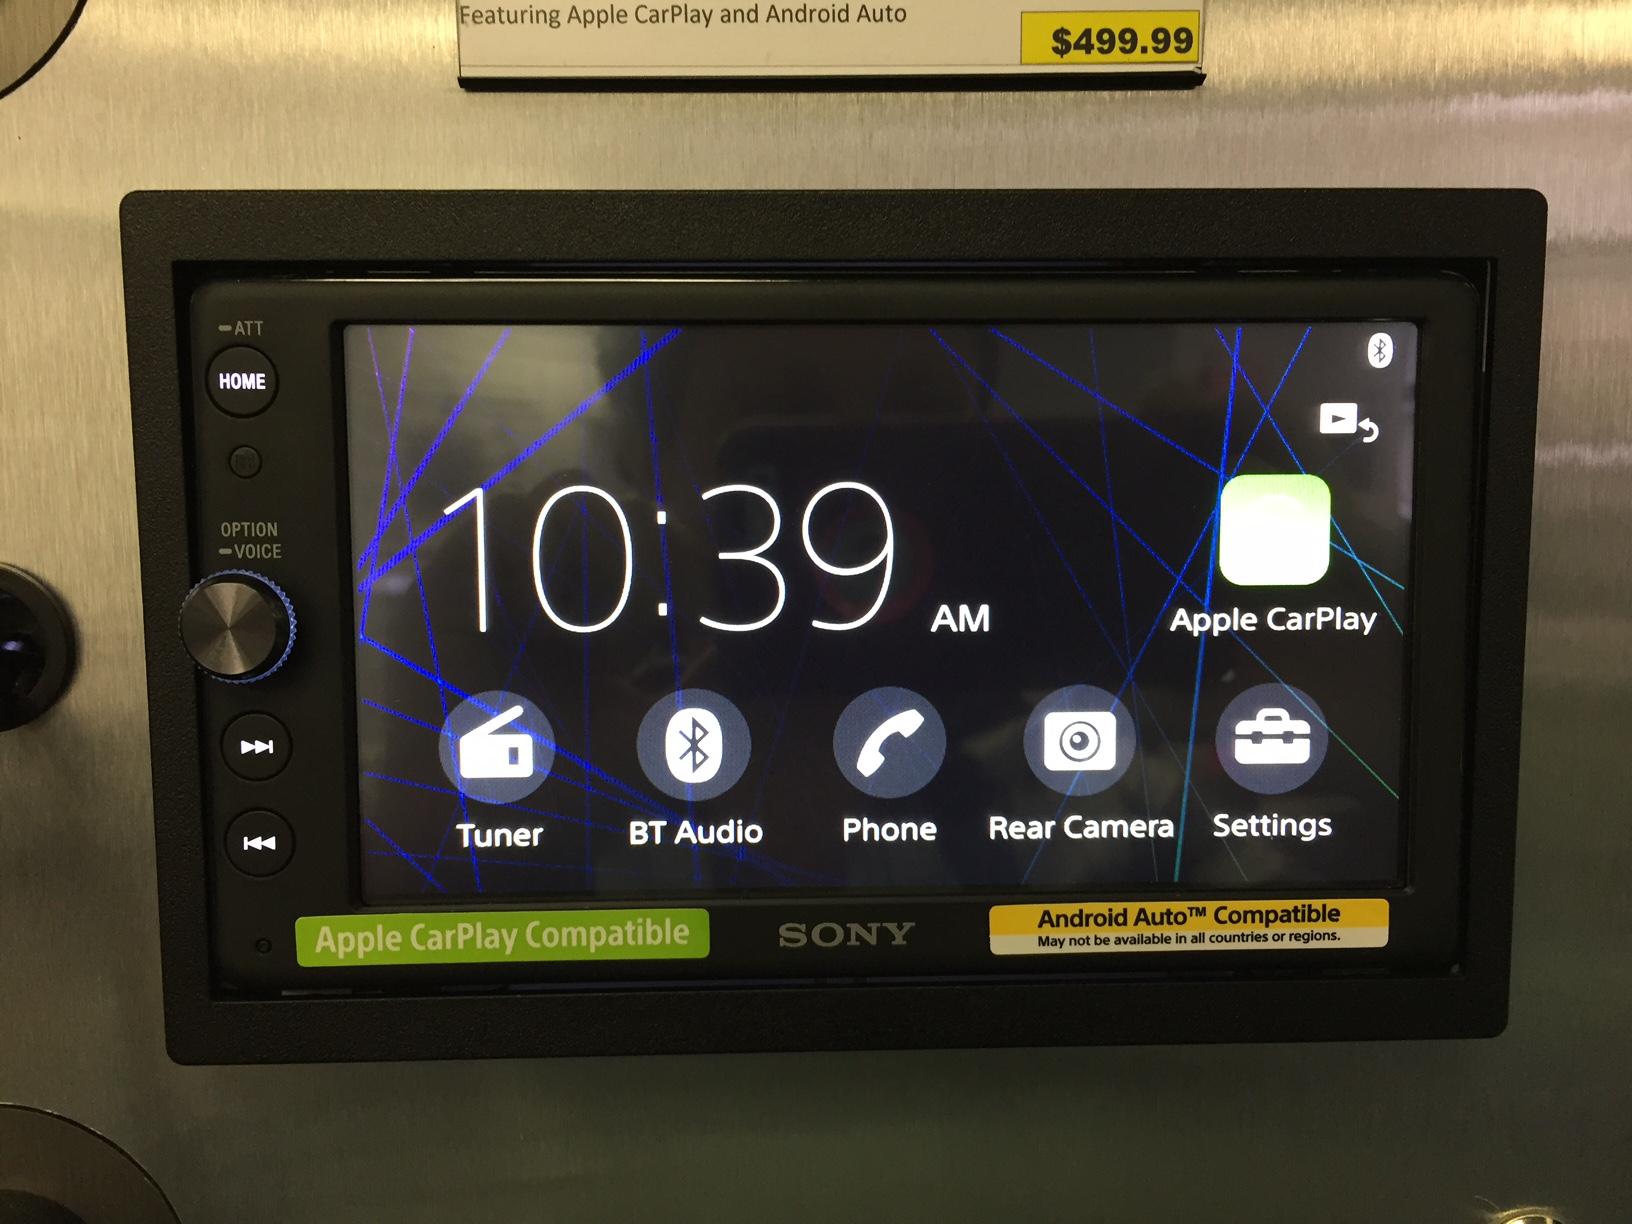 Sony XAV-AX100 Review - Home screen.